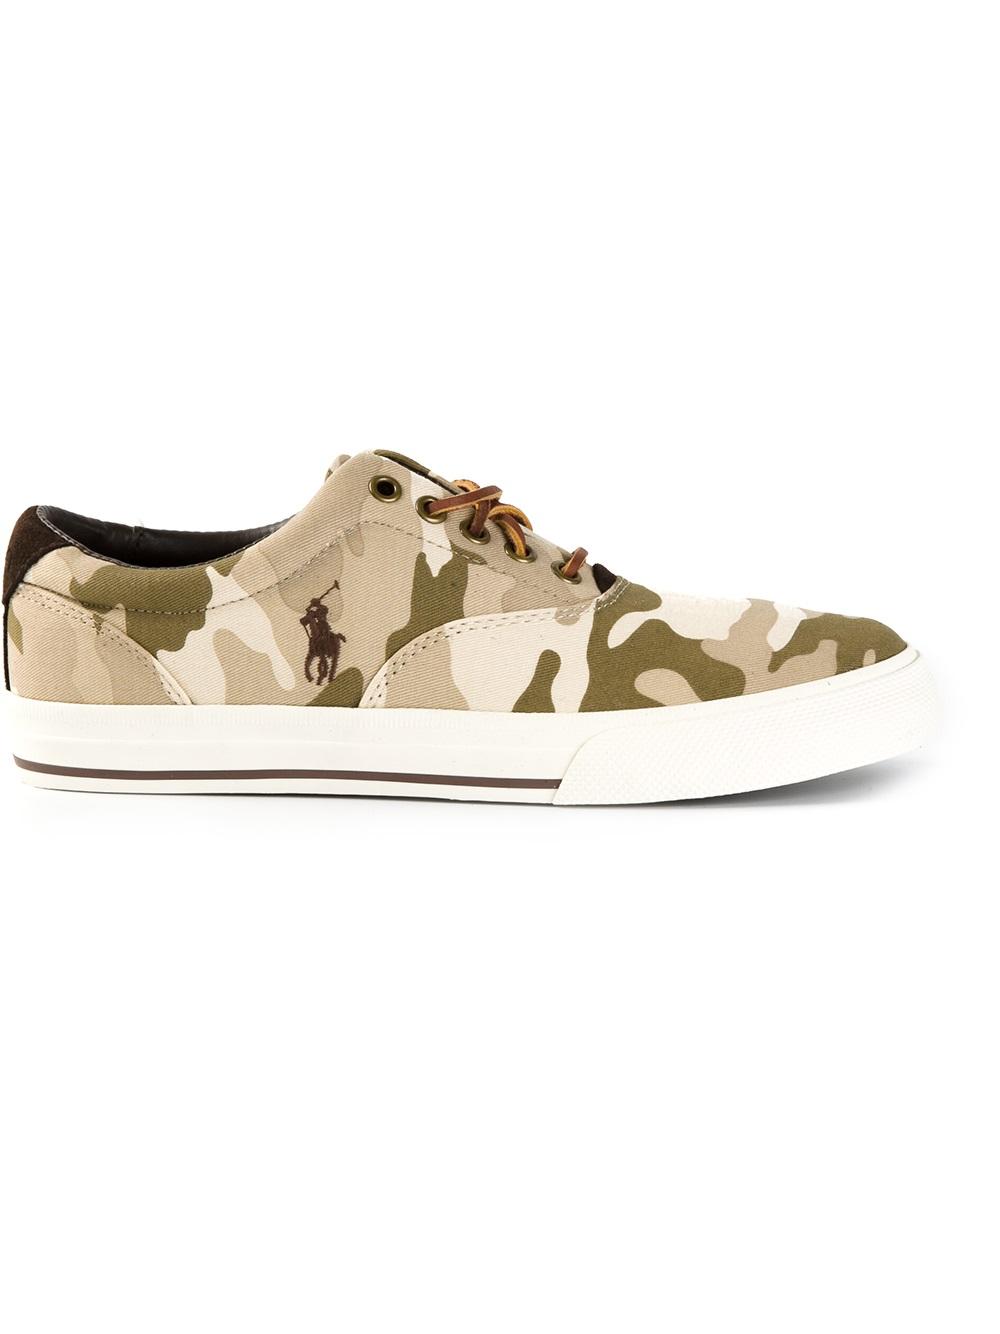 Polo Ralph Lauren Camouflage Sneakers